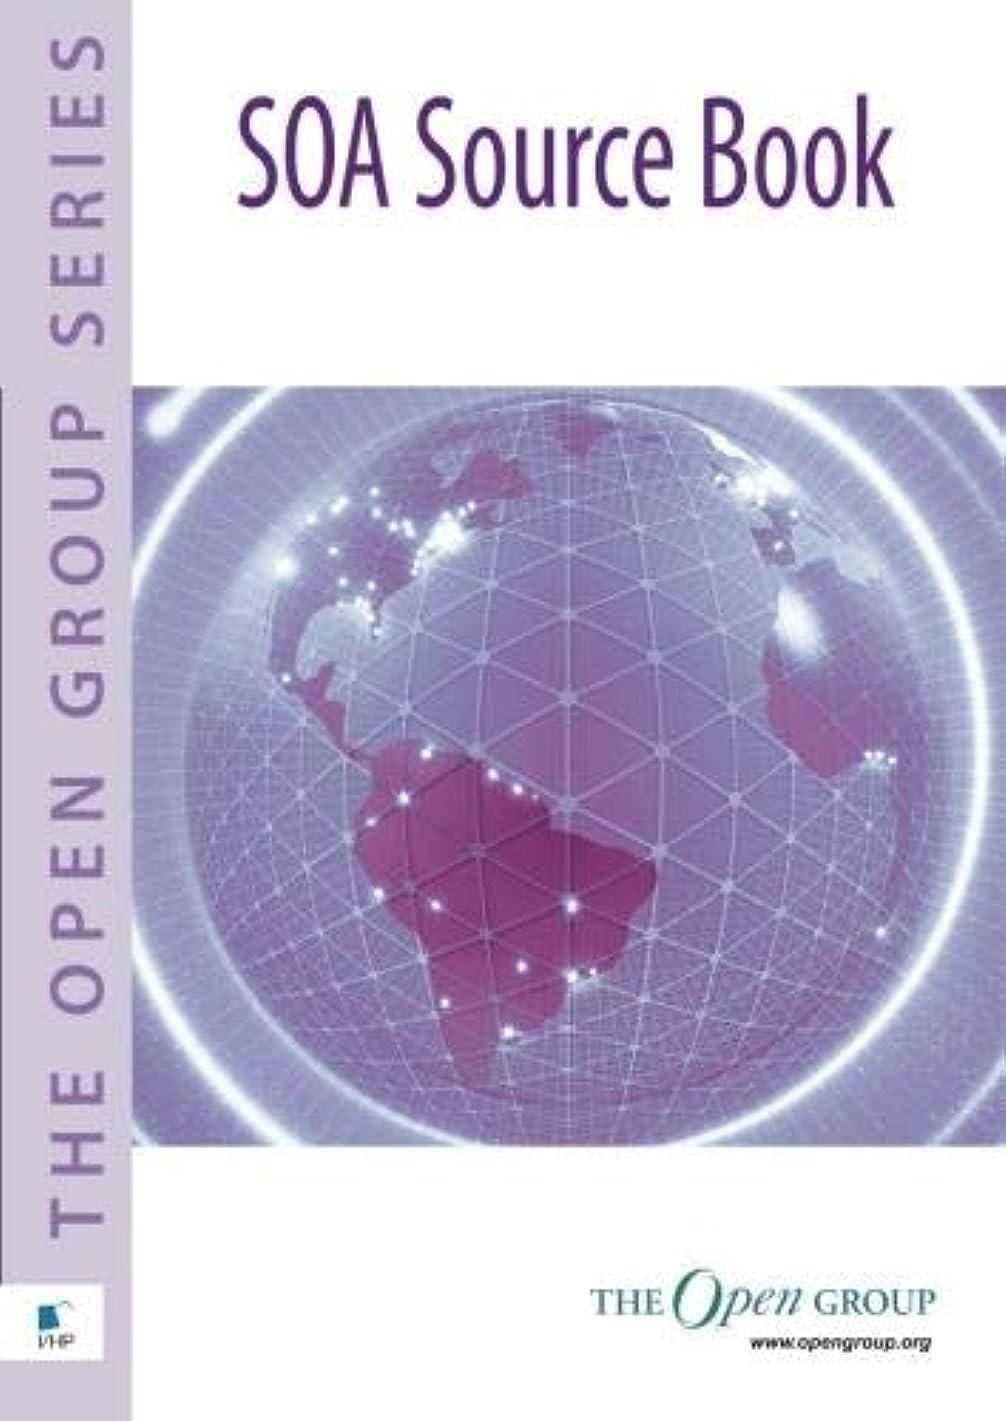 確率鍔貯水池Soa Source Book (TOGAF Series)